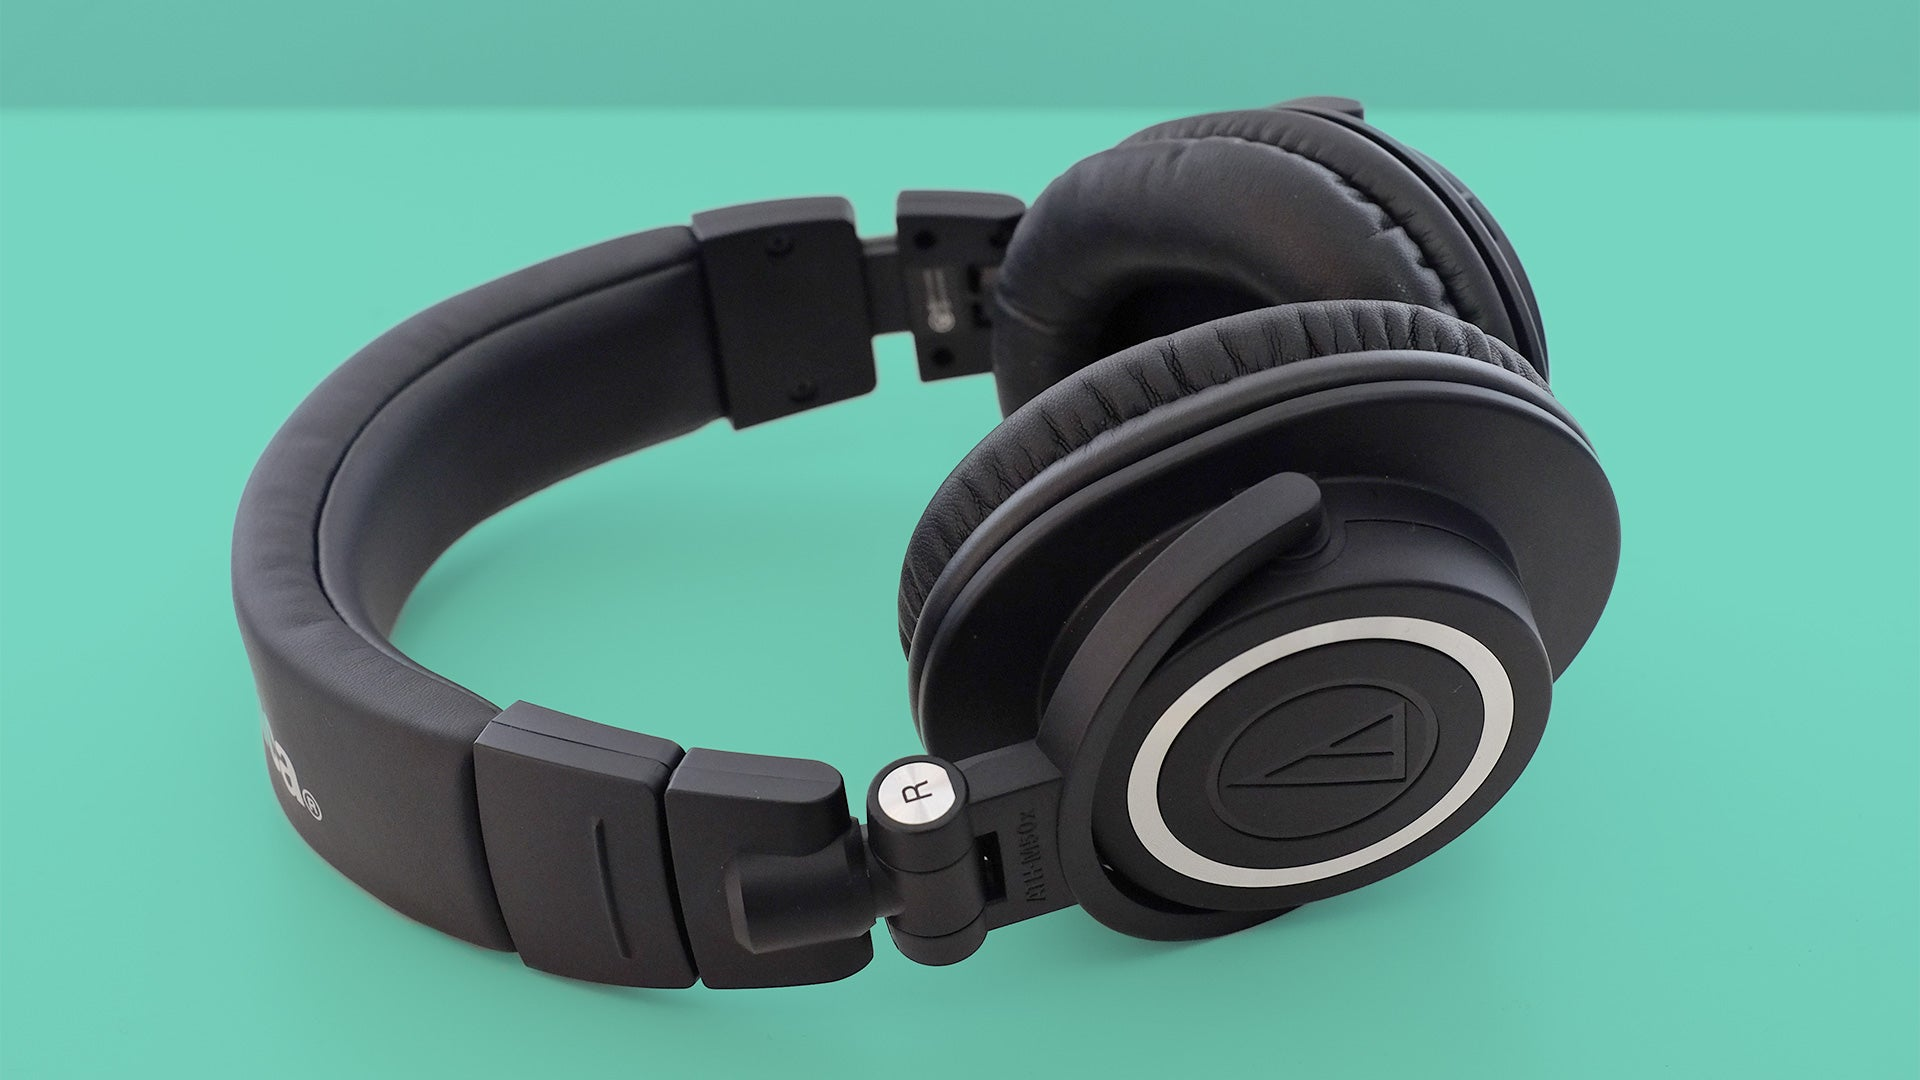 c3b131e8a7c Best Wireless Headphones 2019: 14 awesome Bluetooth headphones